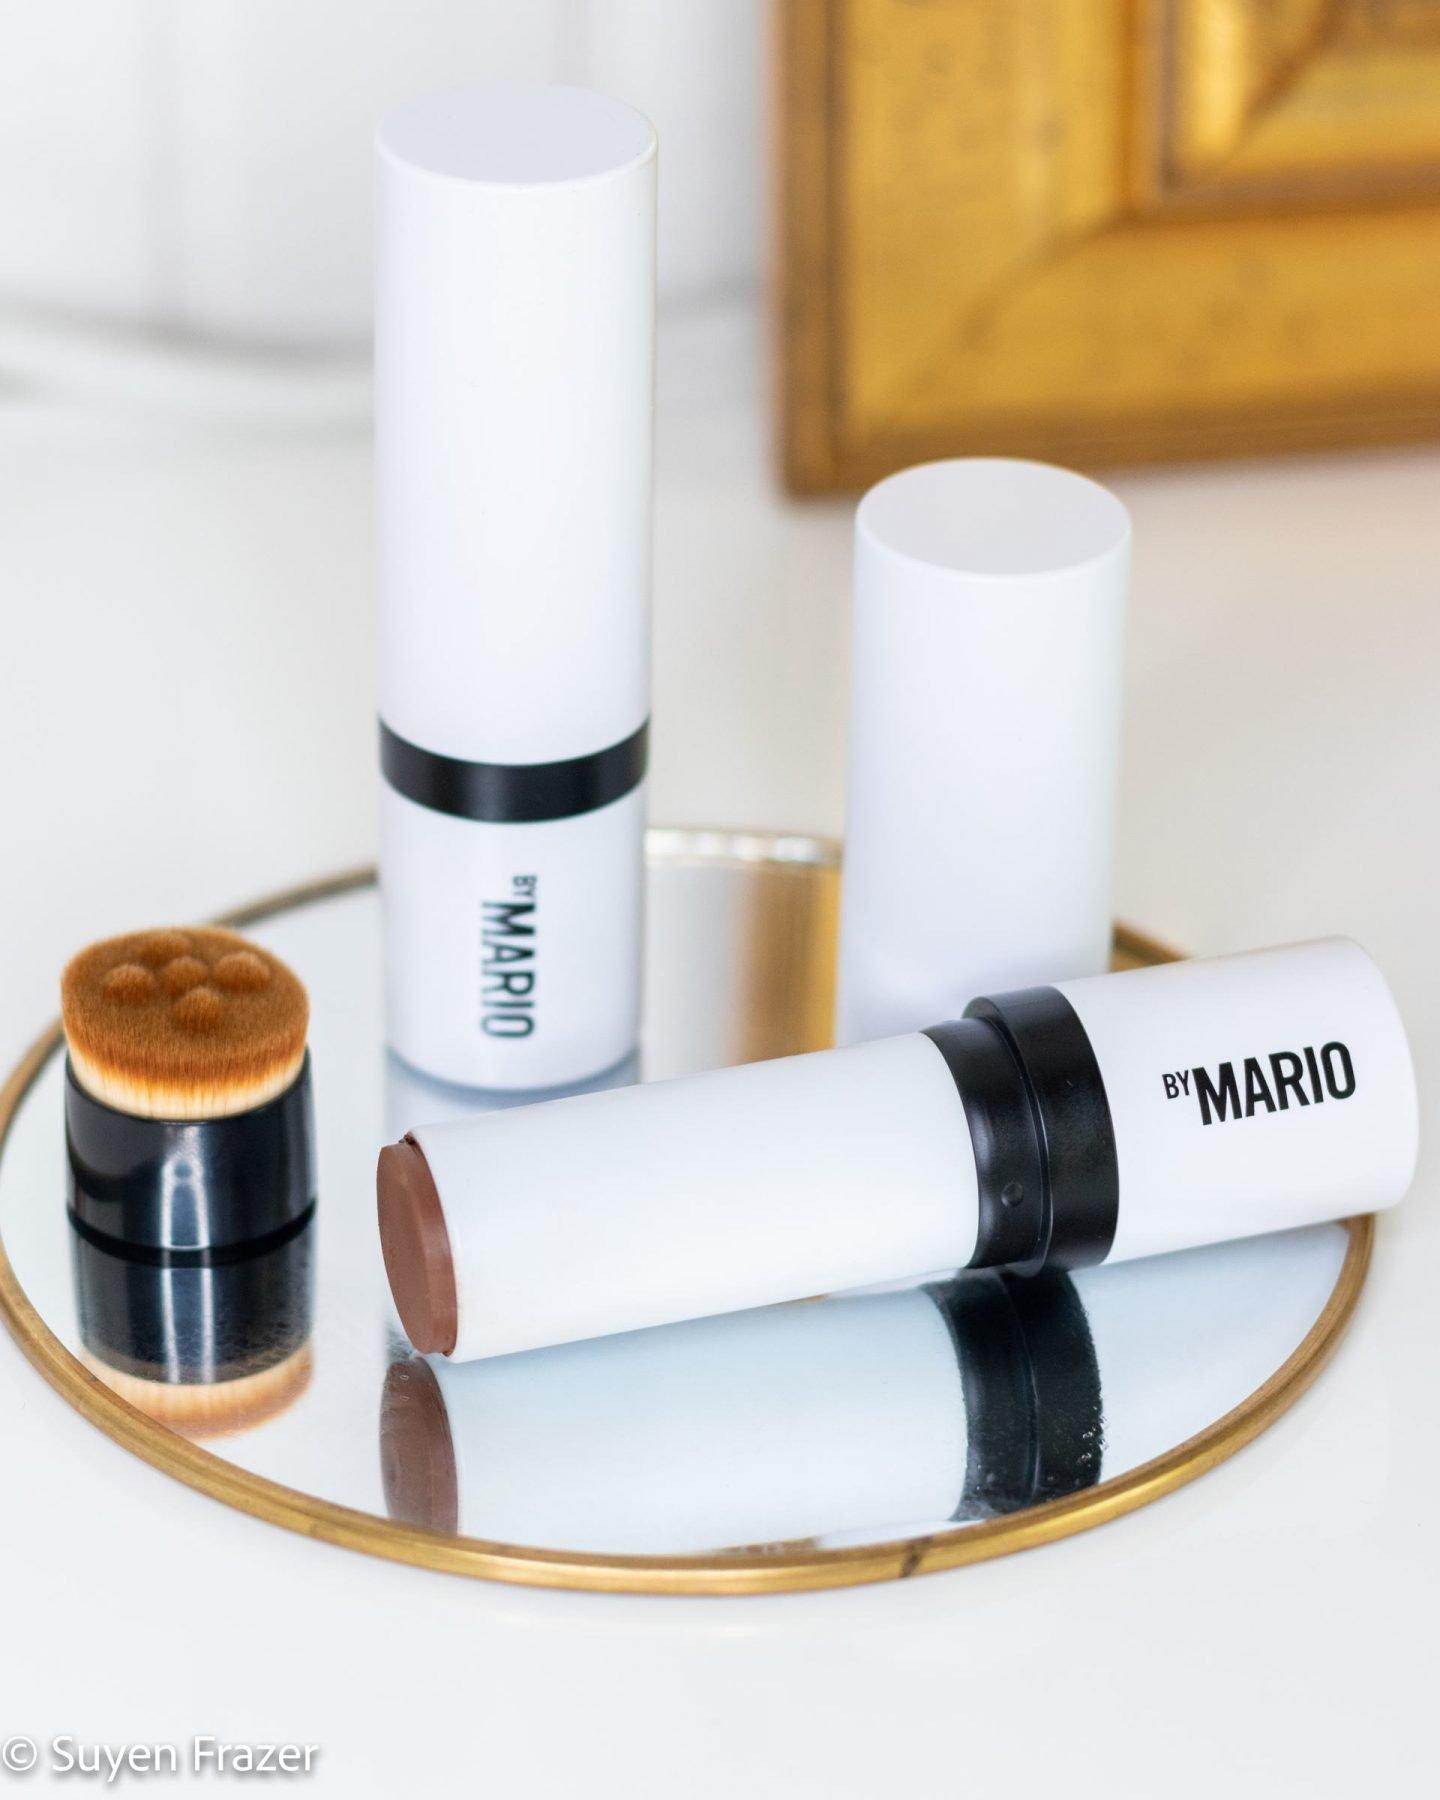 Makeup By Mario Contour Stick Review